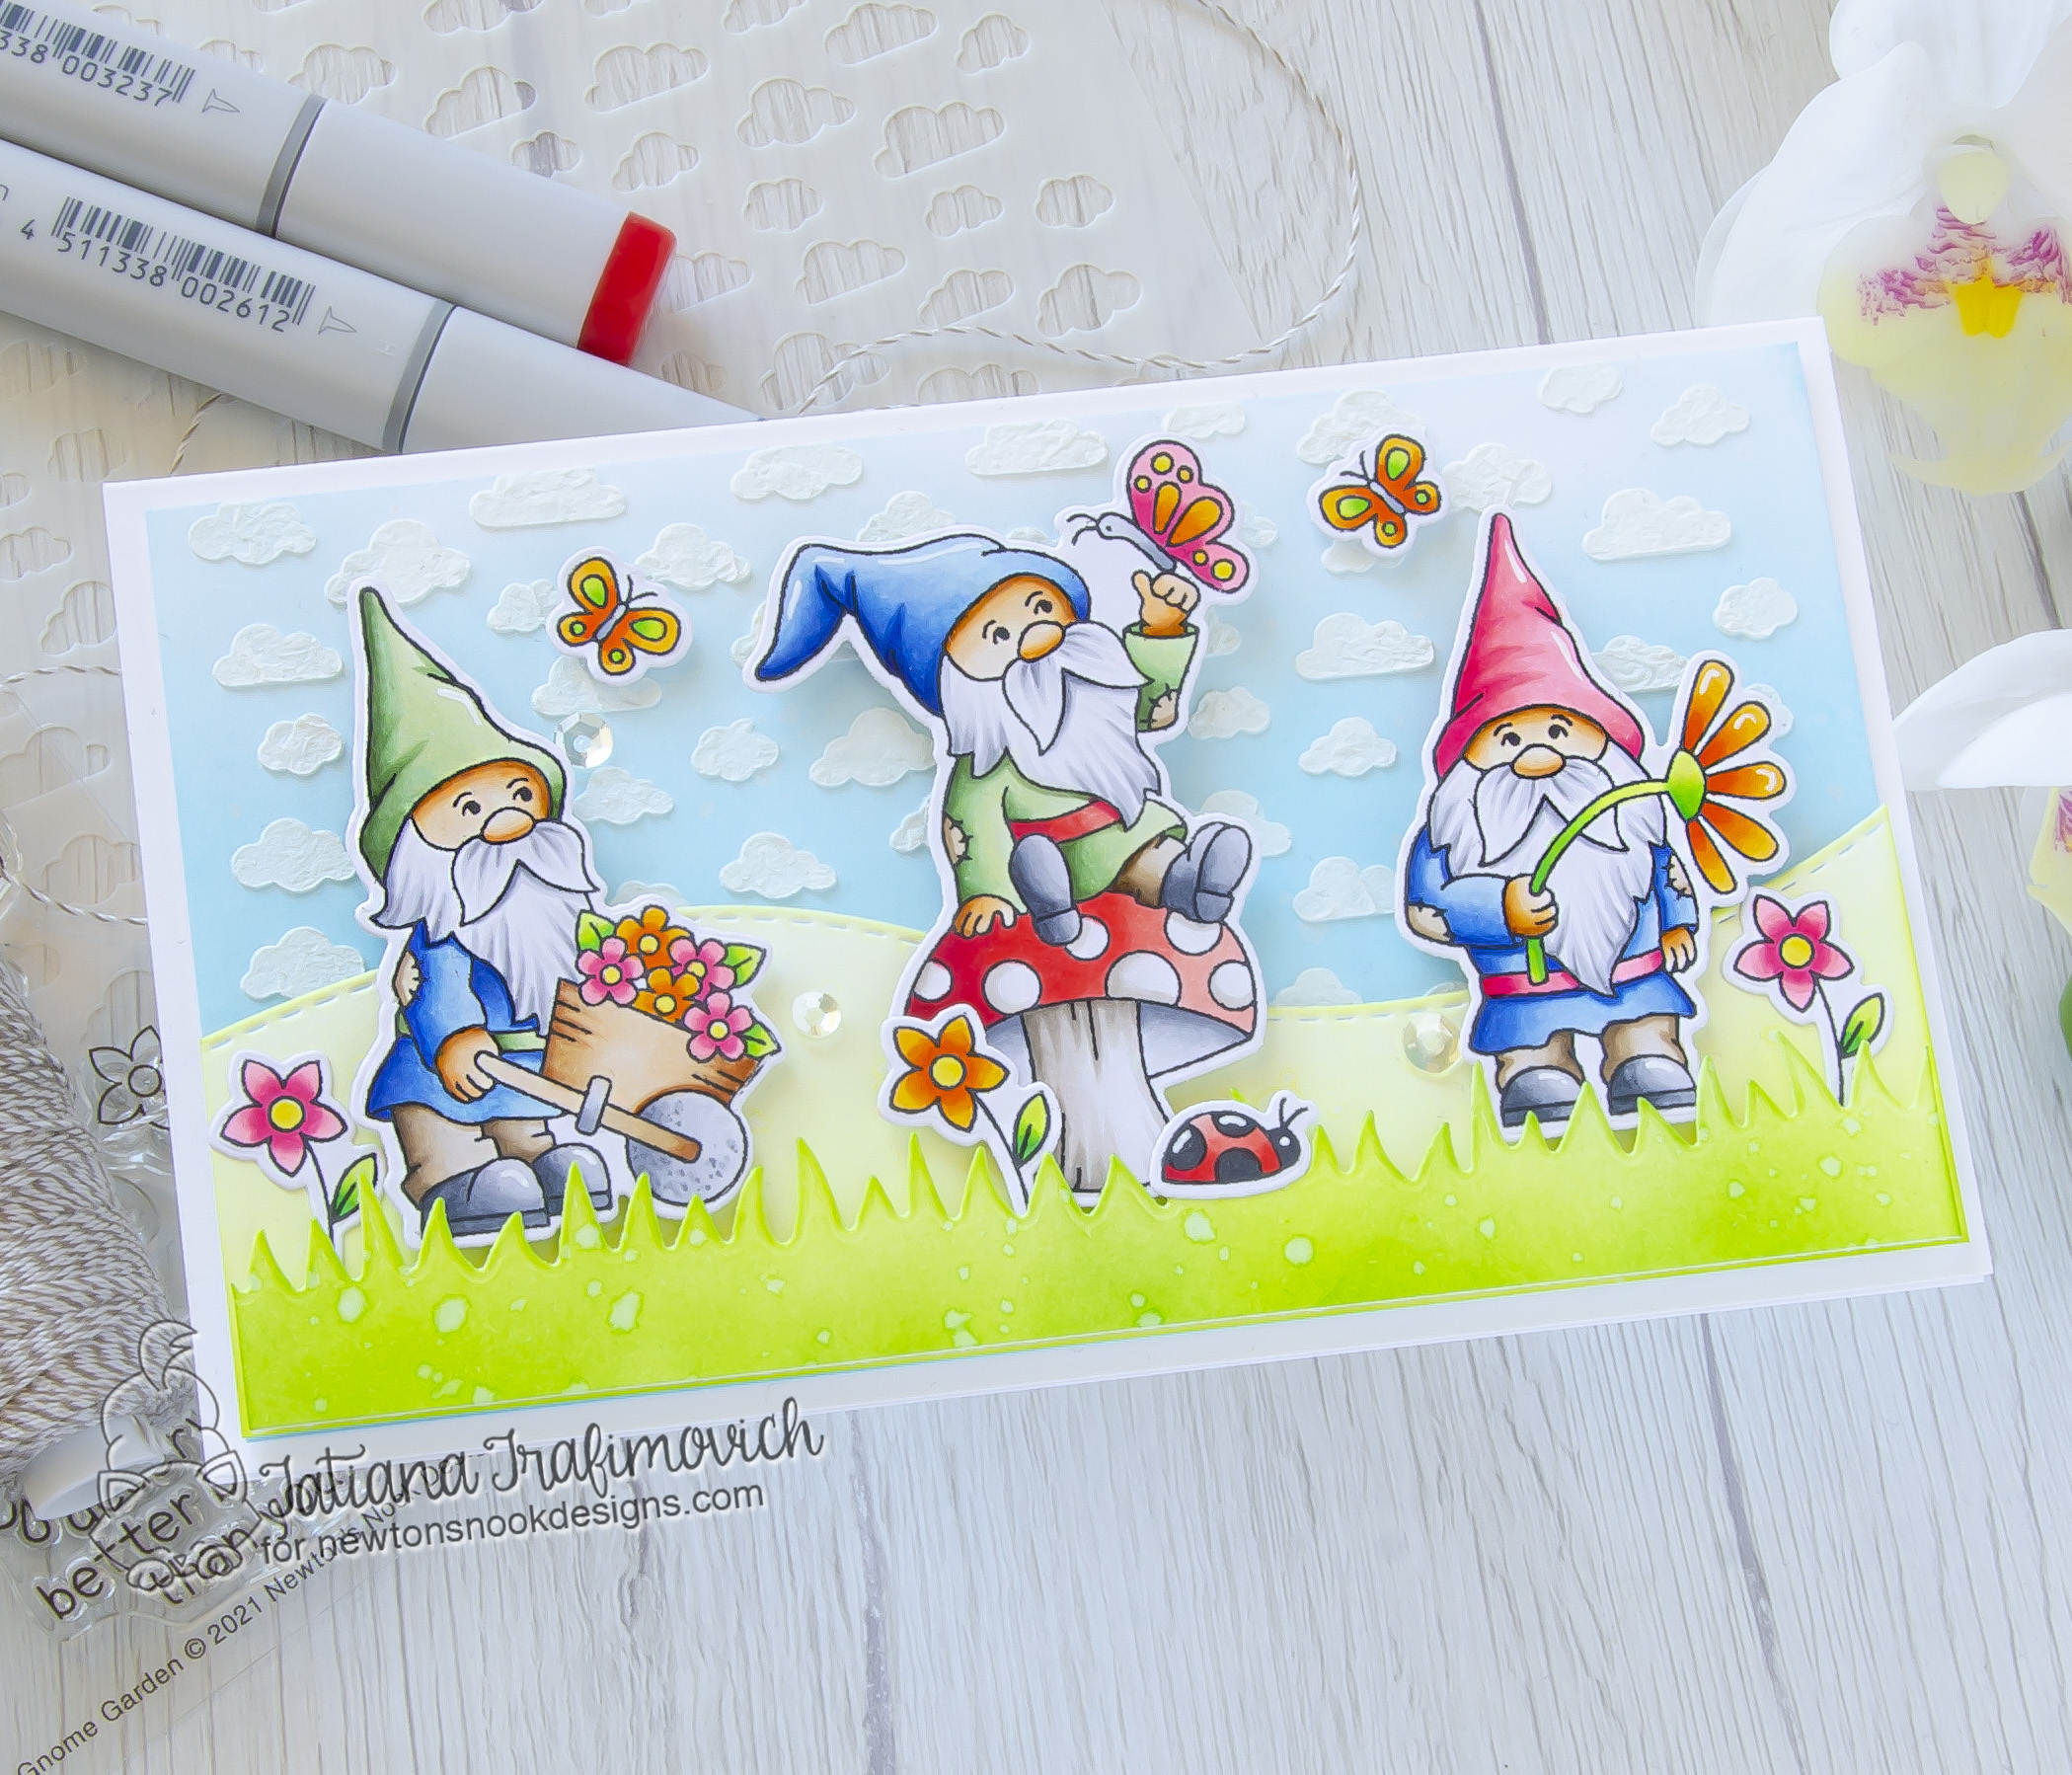 Gnome-One Deserves A Better Birthday Than You! #handmade card by Tatiana Trafimovich #tatianacraftandart - Gnome Garden stamp set by Newton's Nook Designs #newtonsnook